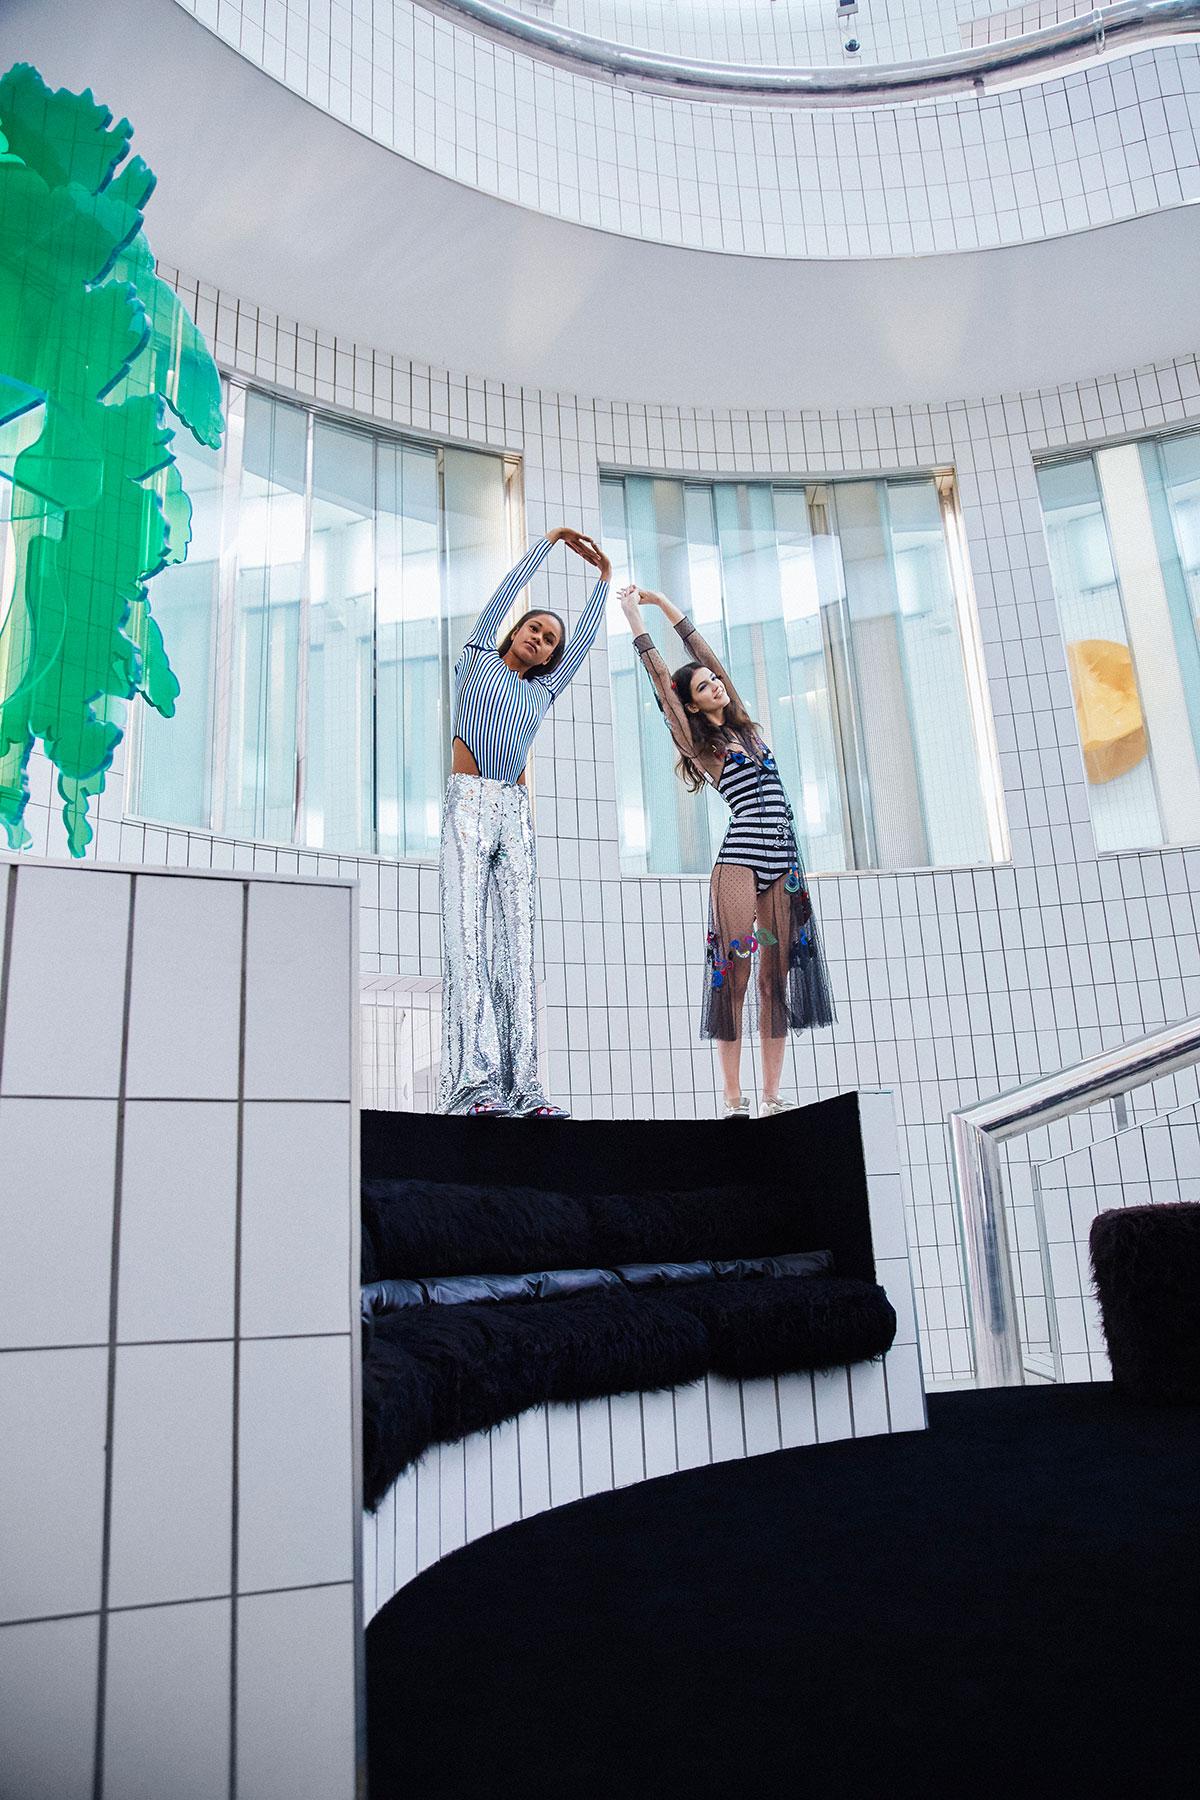 Vogue Italia - There Are Two Fishes On My Sofa. Par Matteo Strocchia, Sarah Venturini.